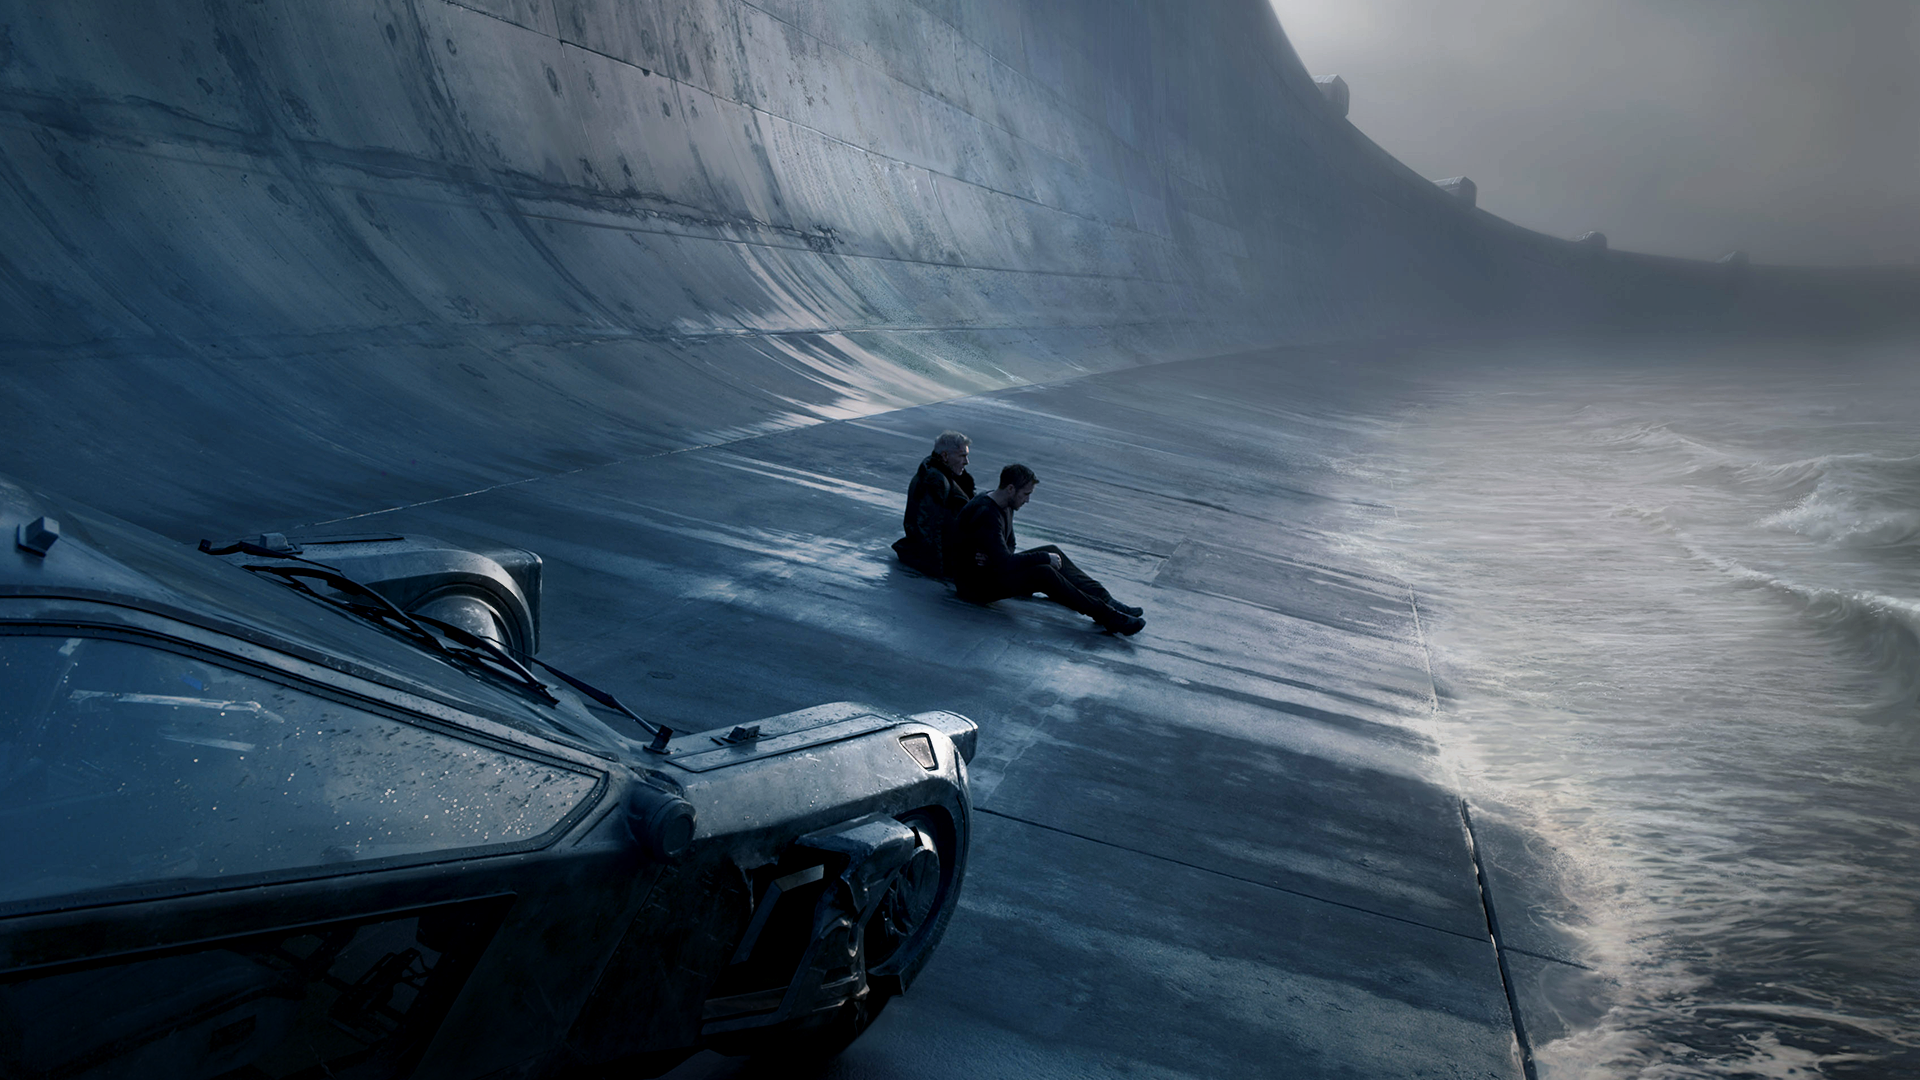 Blade Runner 2049 Wallpapers Top Free Blade Runner 2049